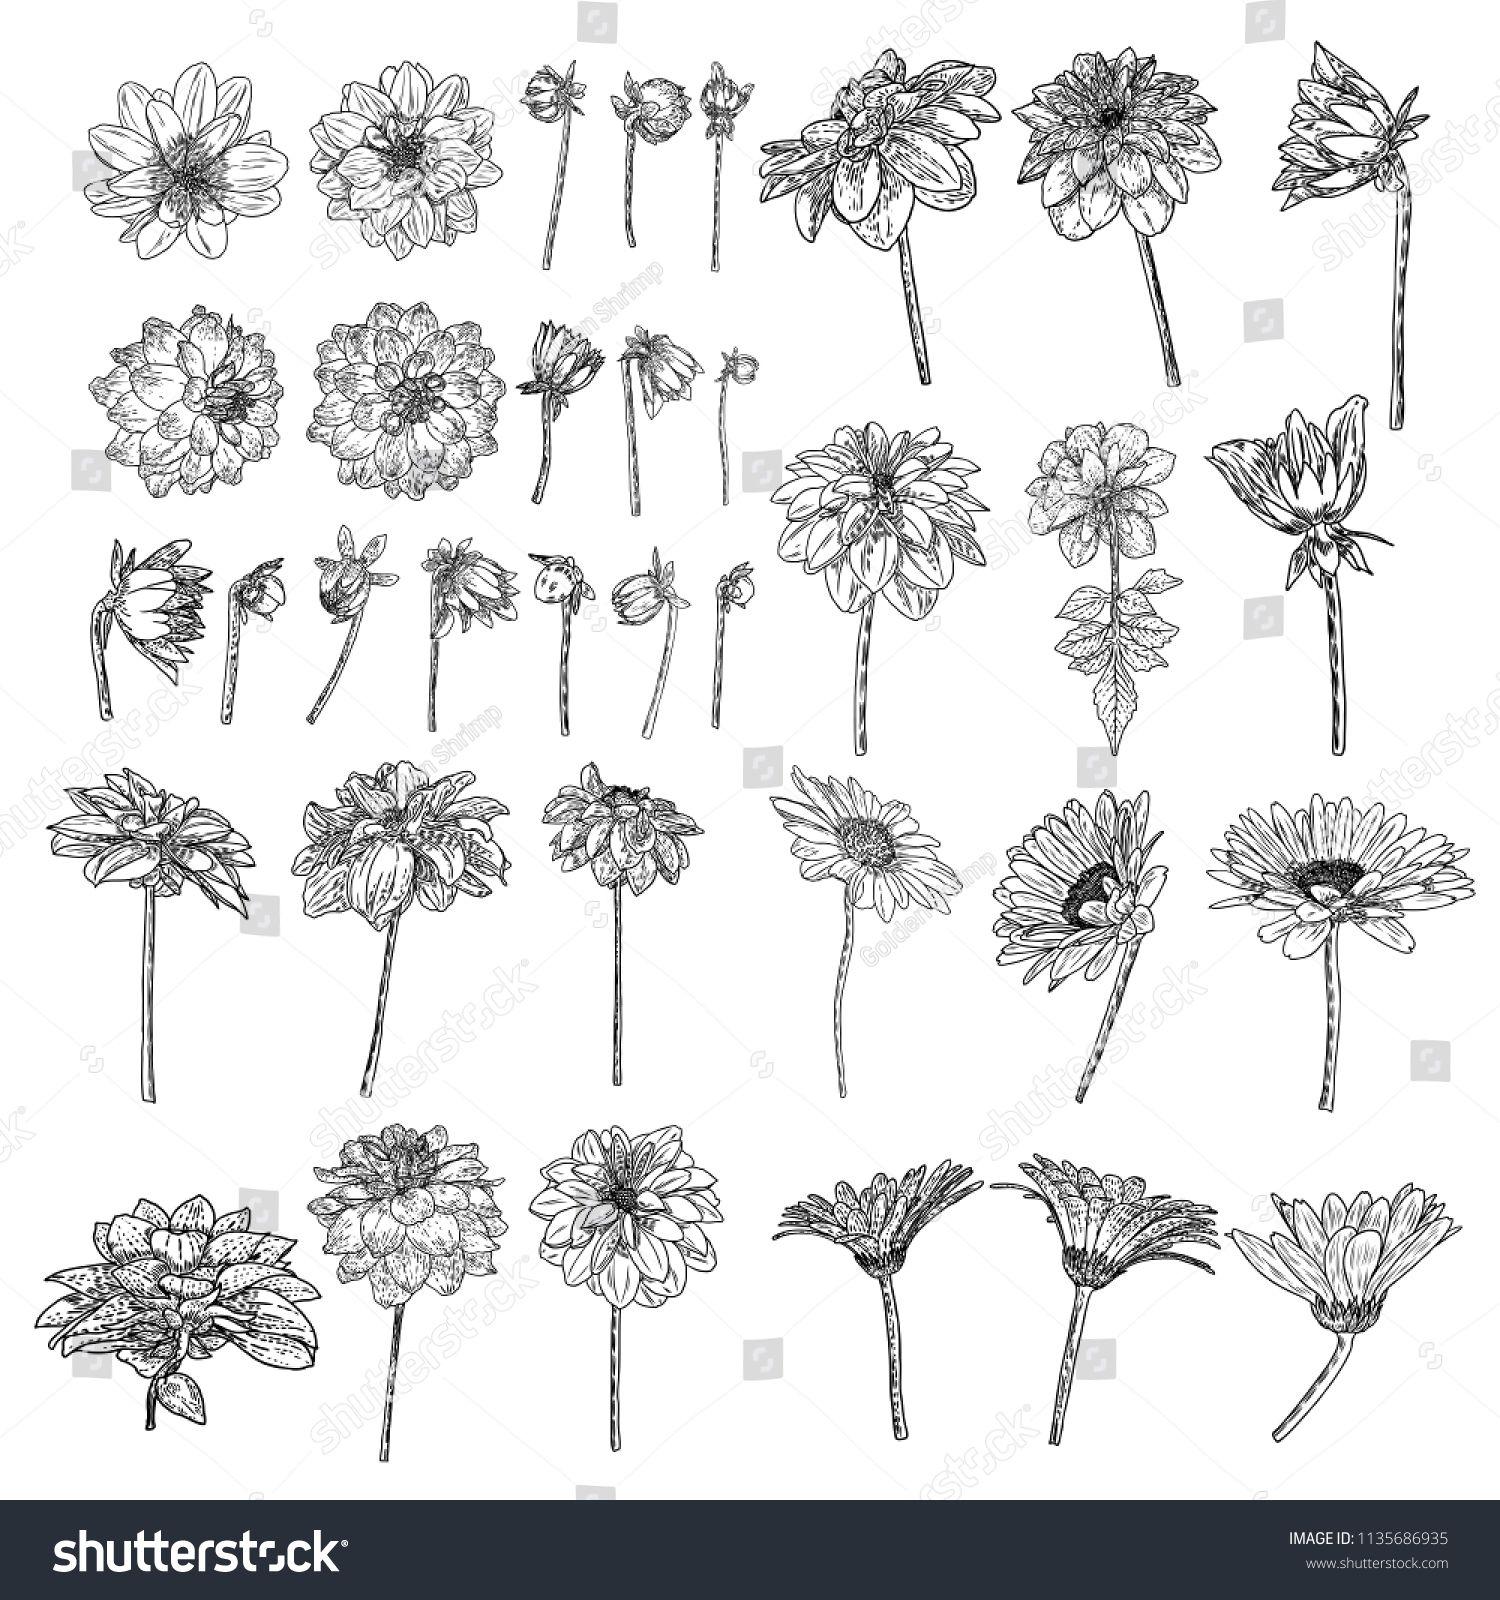 Gerbera Daisy Coloring Page Free Printable Coloring Pages Daisy Drawing Daisy Flower Drawing Flower Drawing